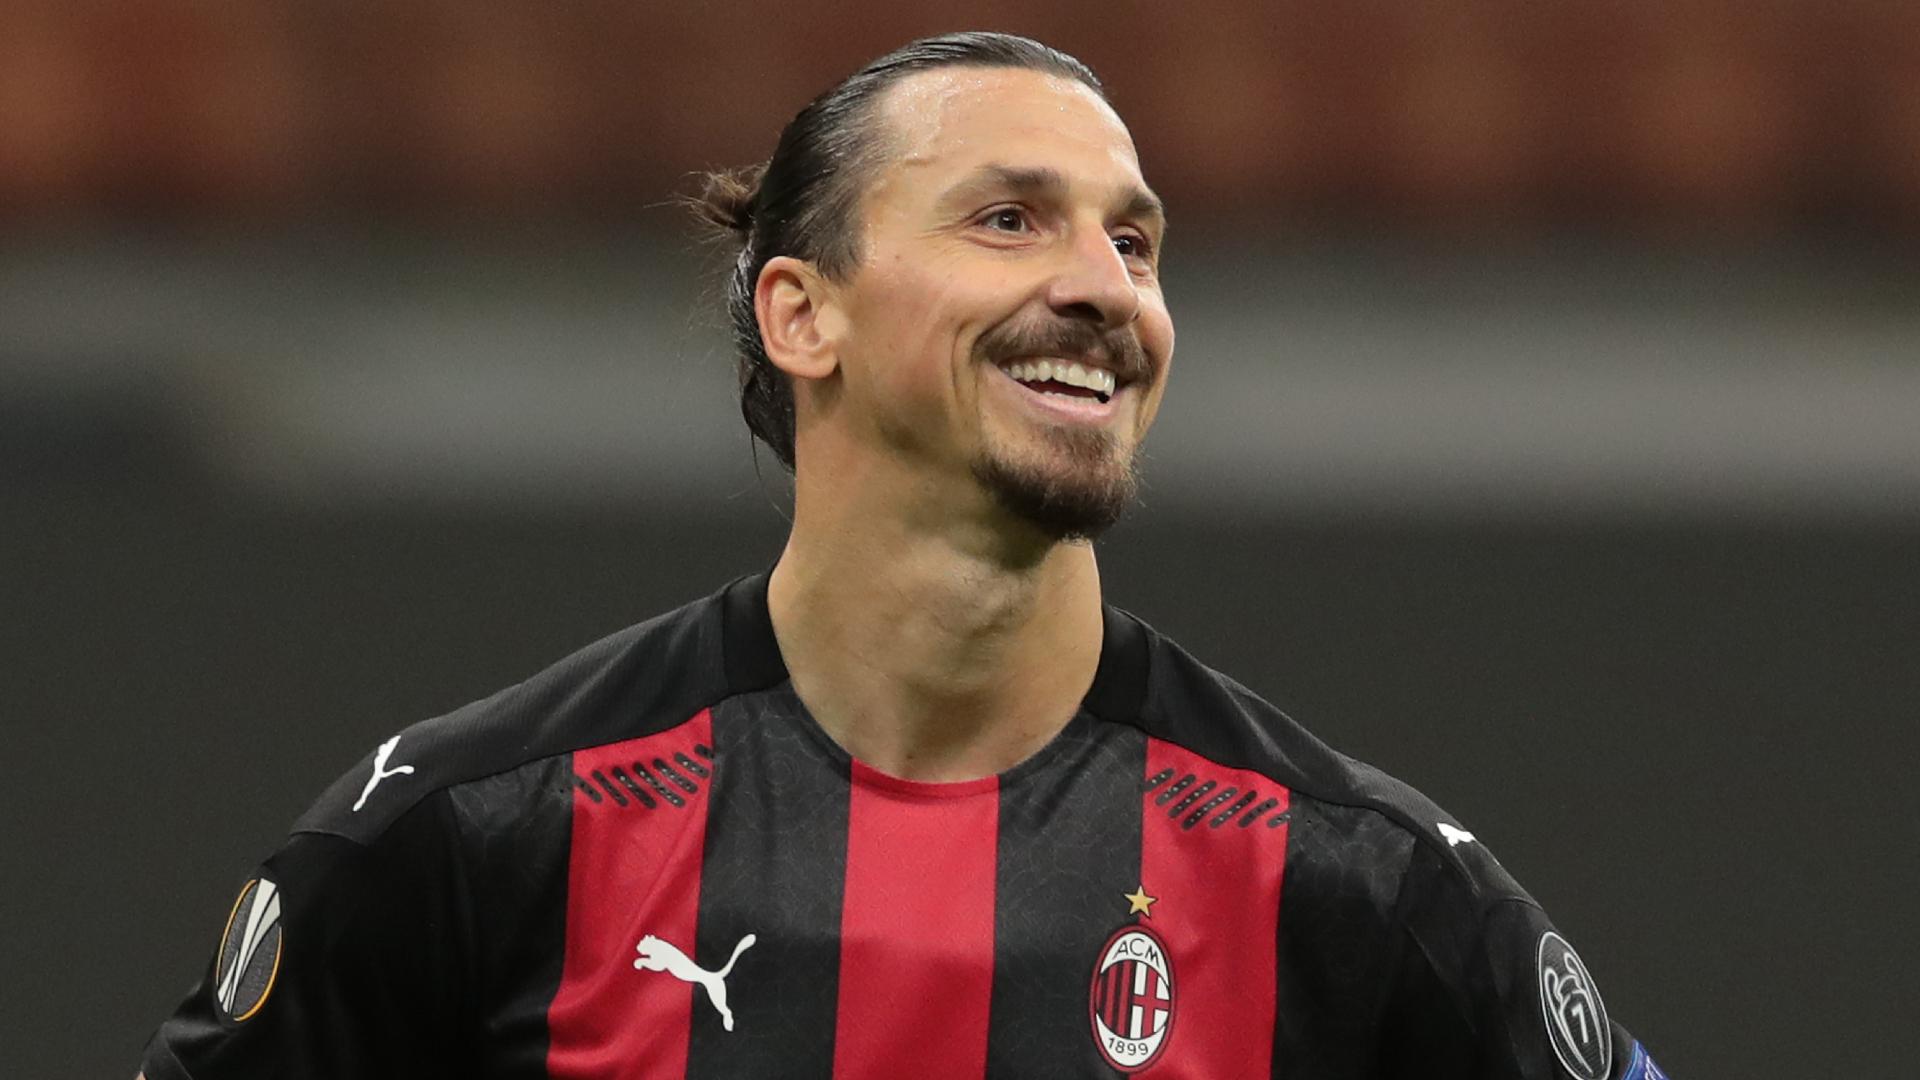 'You cannot tame Zlatan' - Milan star Ibrahimovic says he is 'better' than Benjamin Button